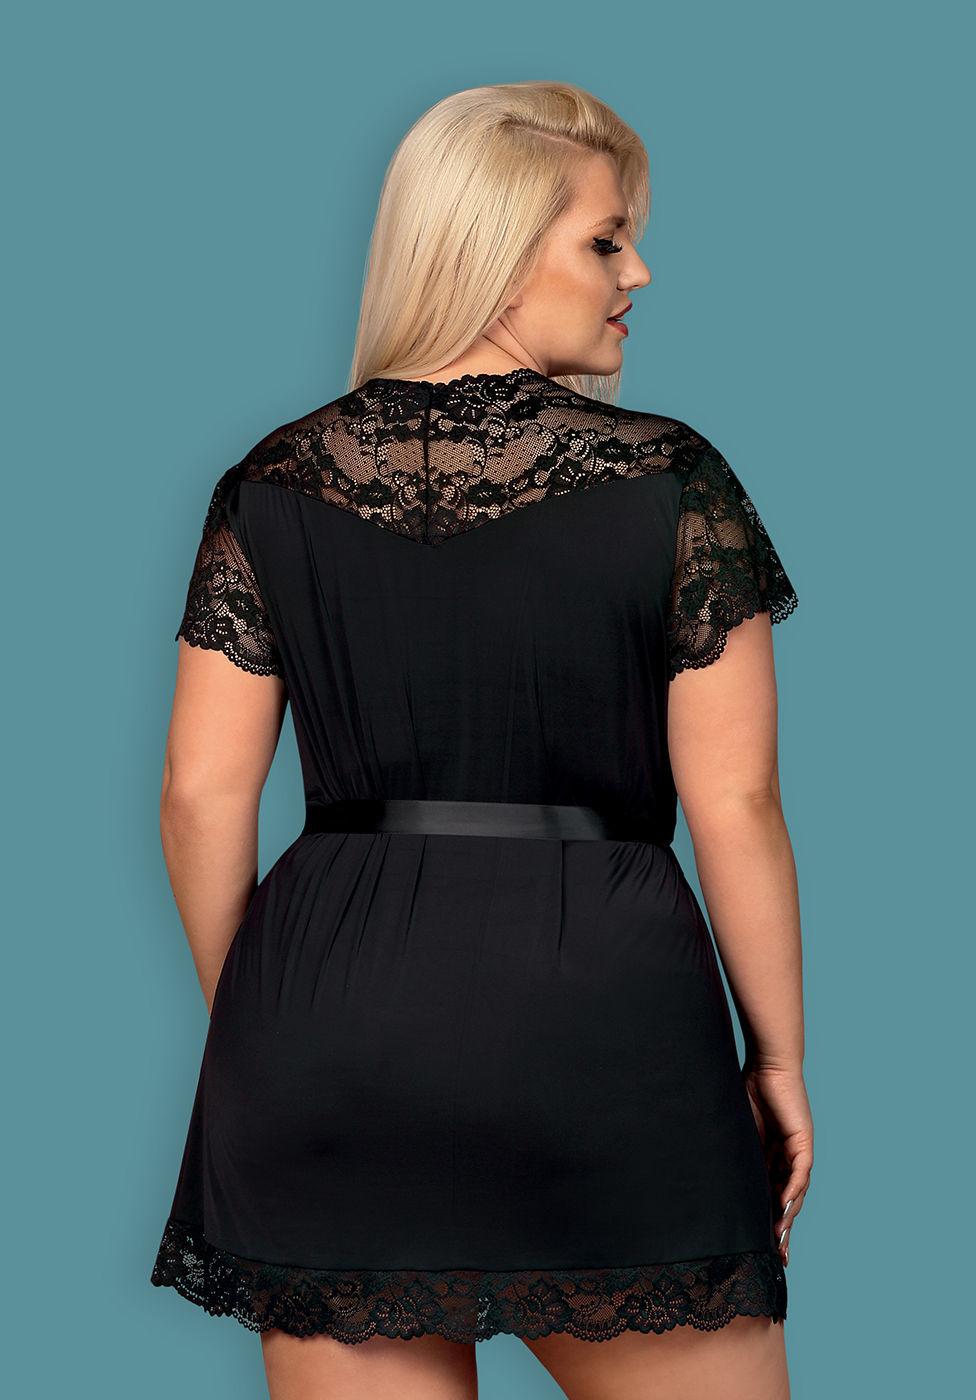 Image de 810-PEI-1 - Elegant Black Lace Robe - XXL